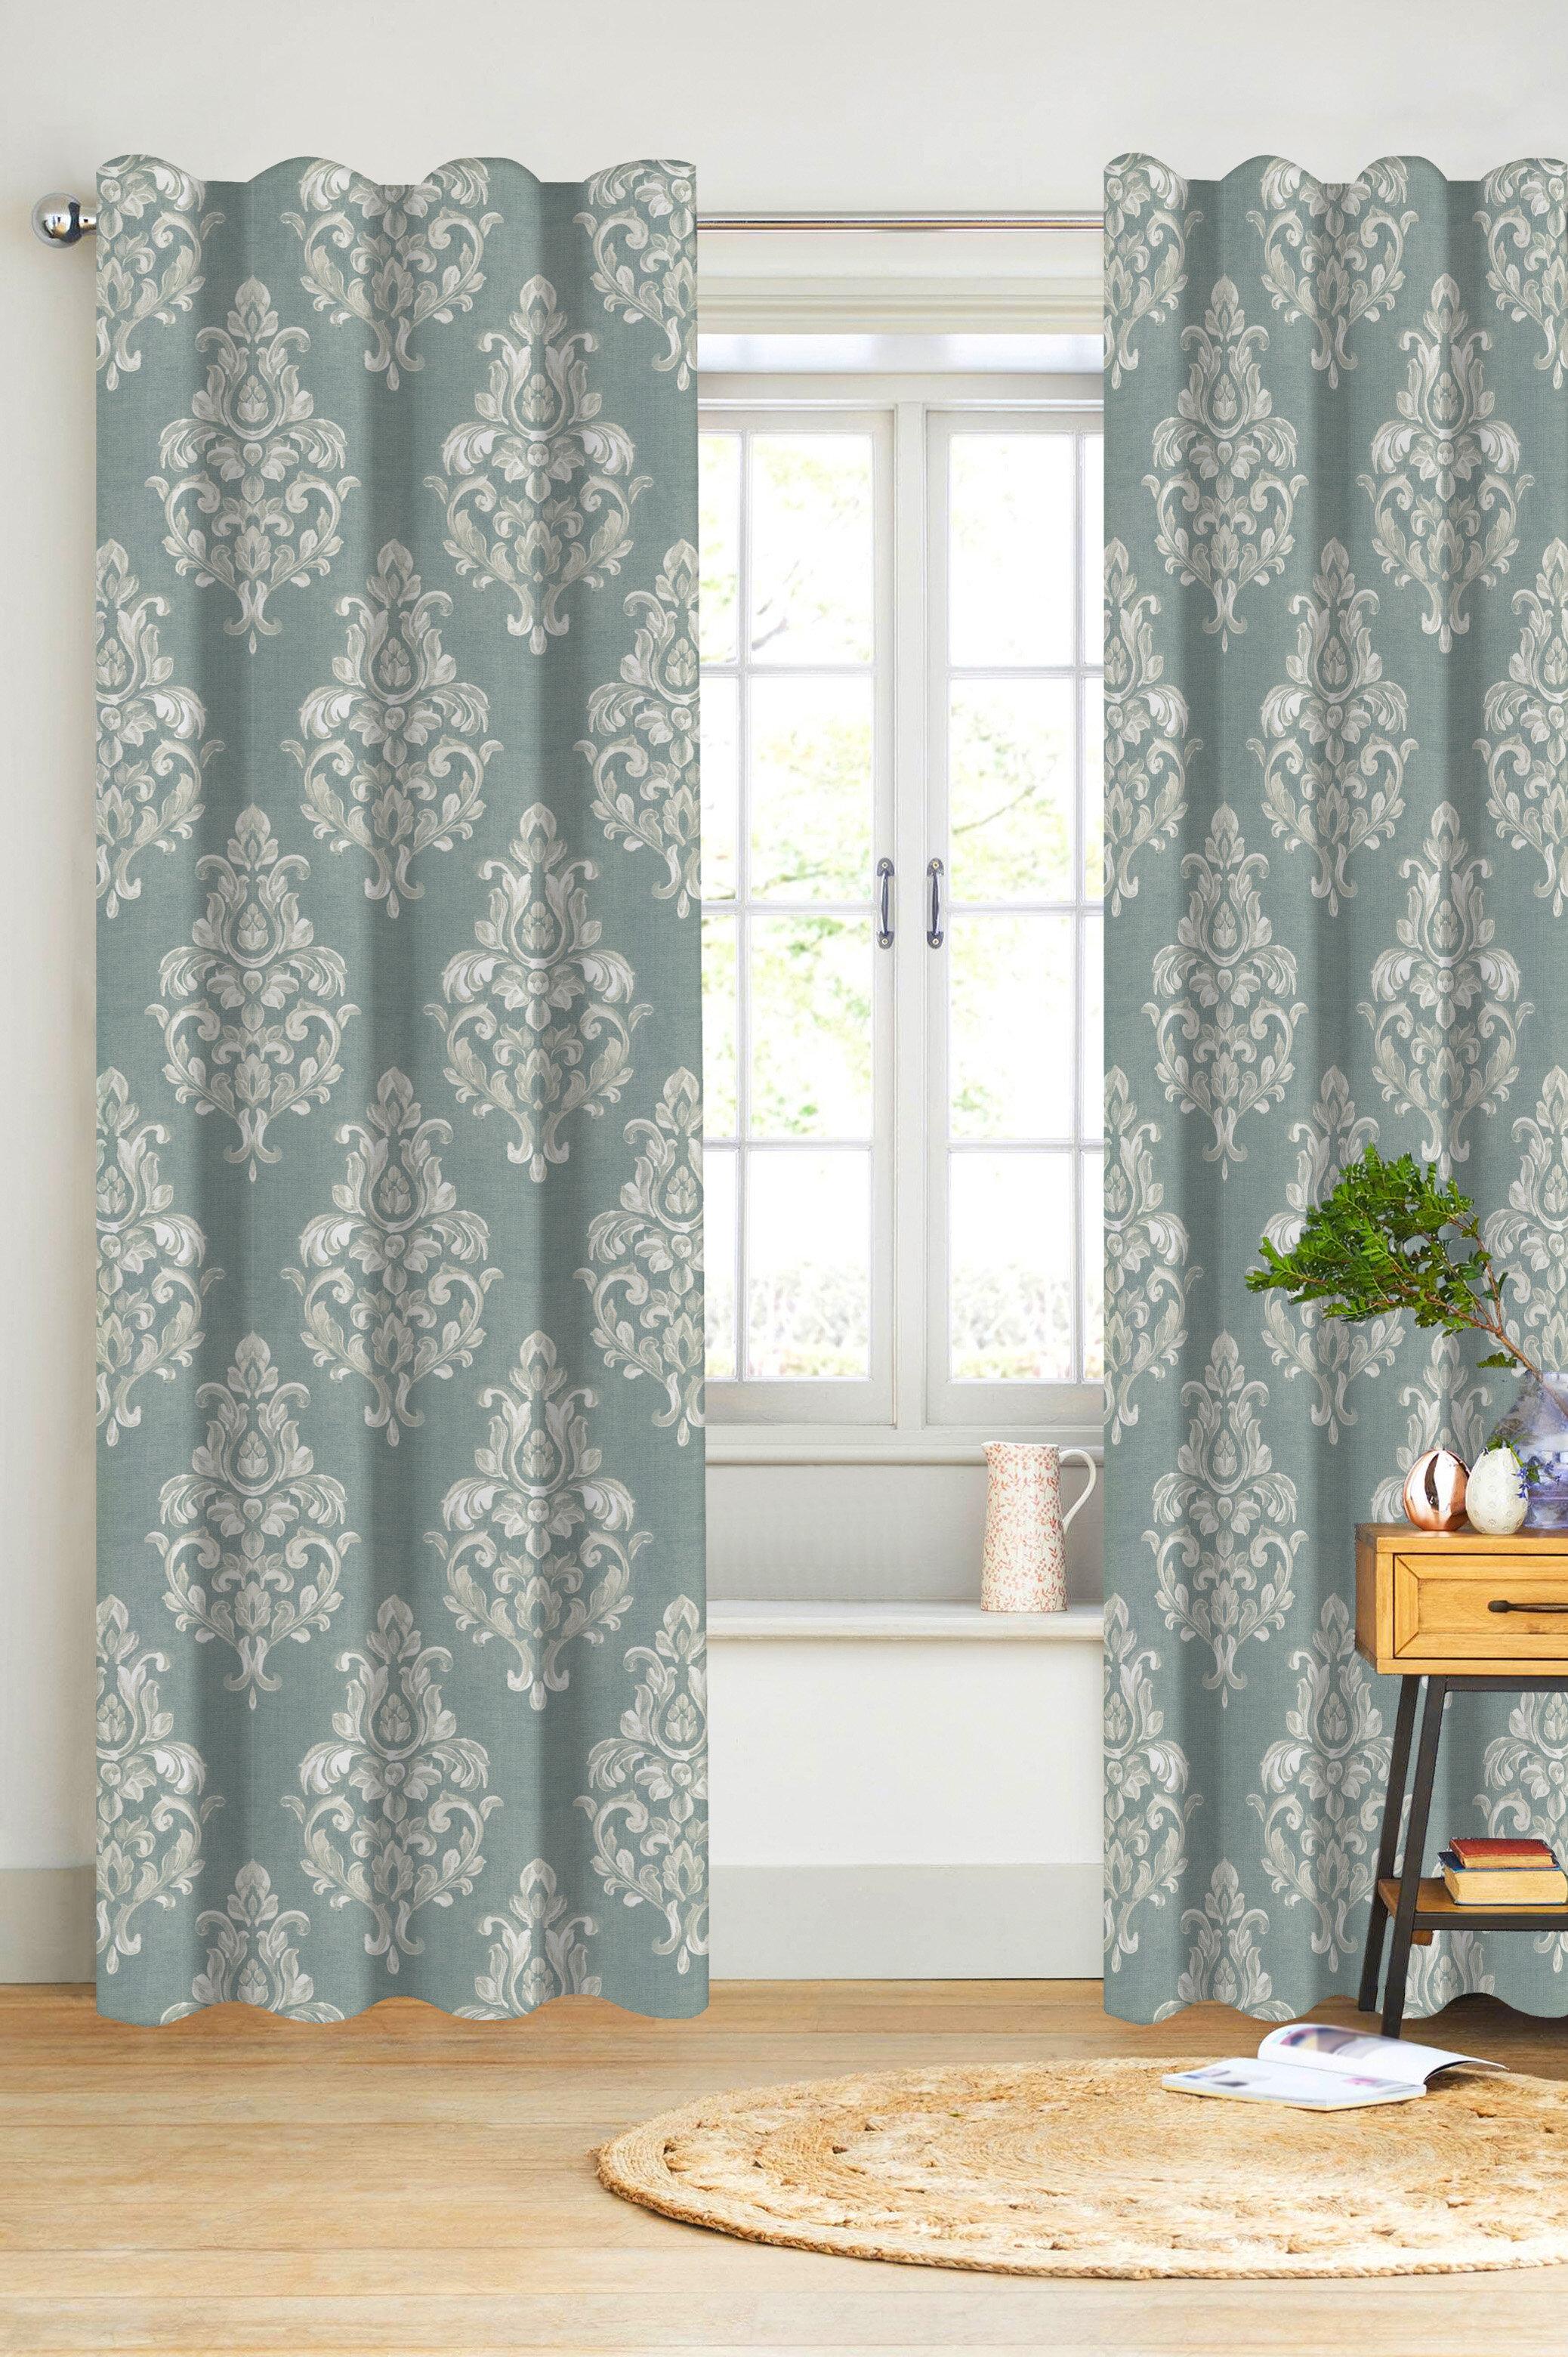 Canora Grey Shoemaker Damask Semi Sheer Curtain Panels | Wayfair Throughout Grey Printed Curtain Panels (View 15 of 20)